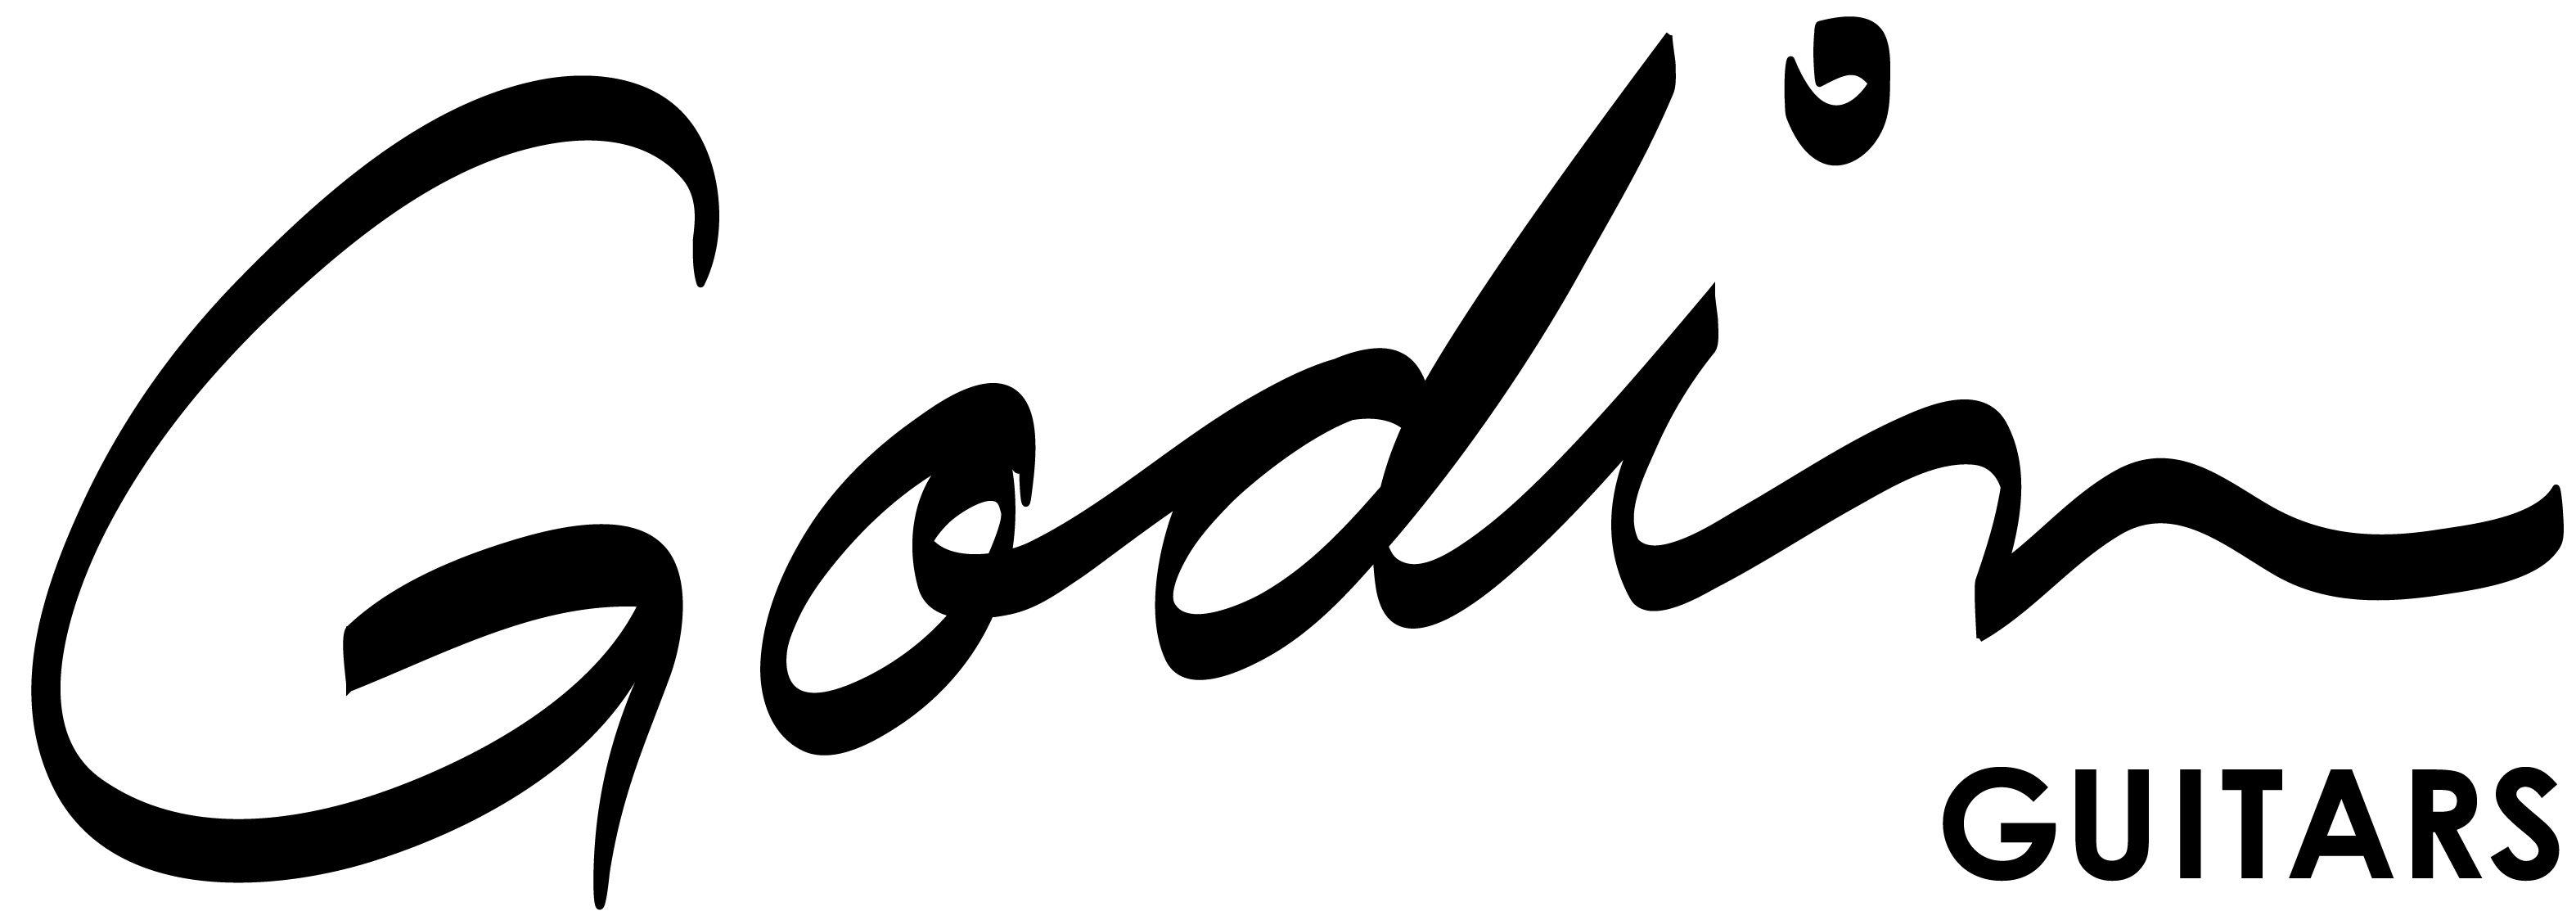 pin by osmel martinez on logos pinterest logos rh pinterest com bass guitar brand logos guitar brand logo stickers